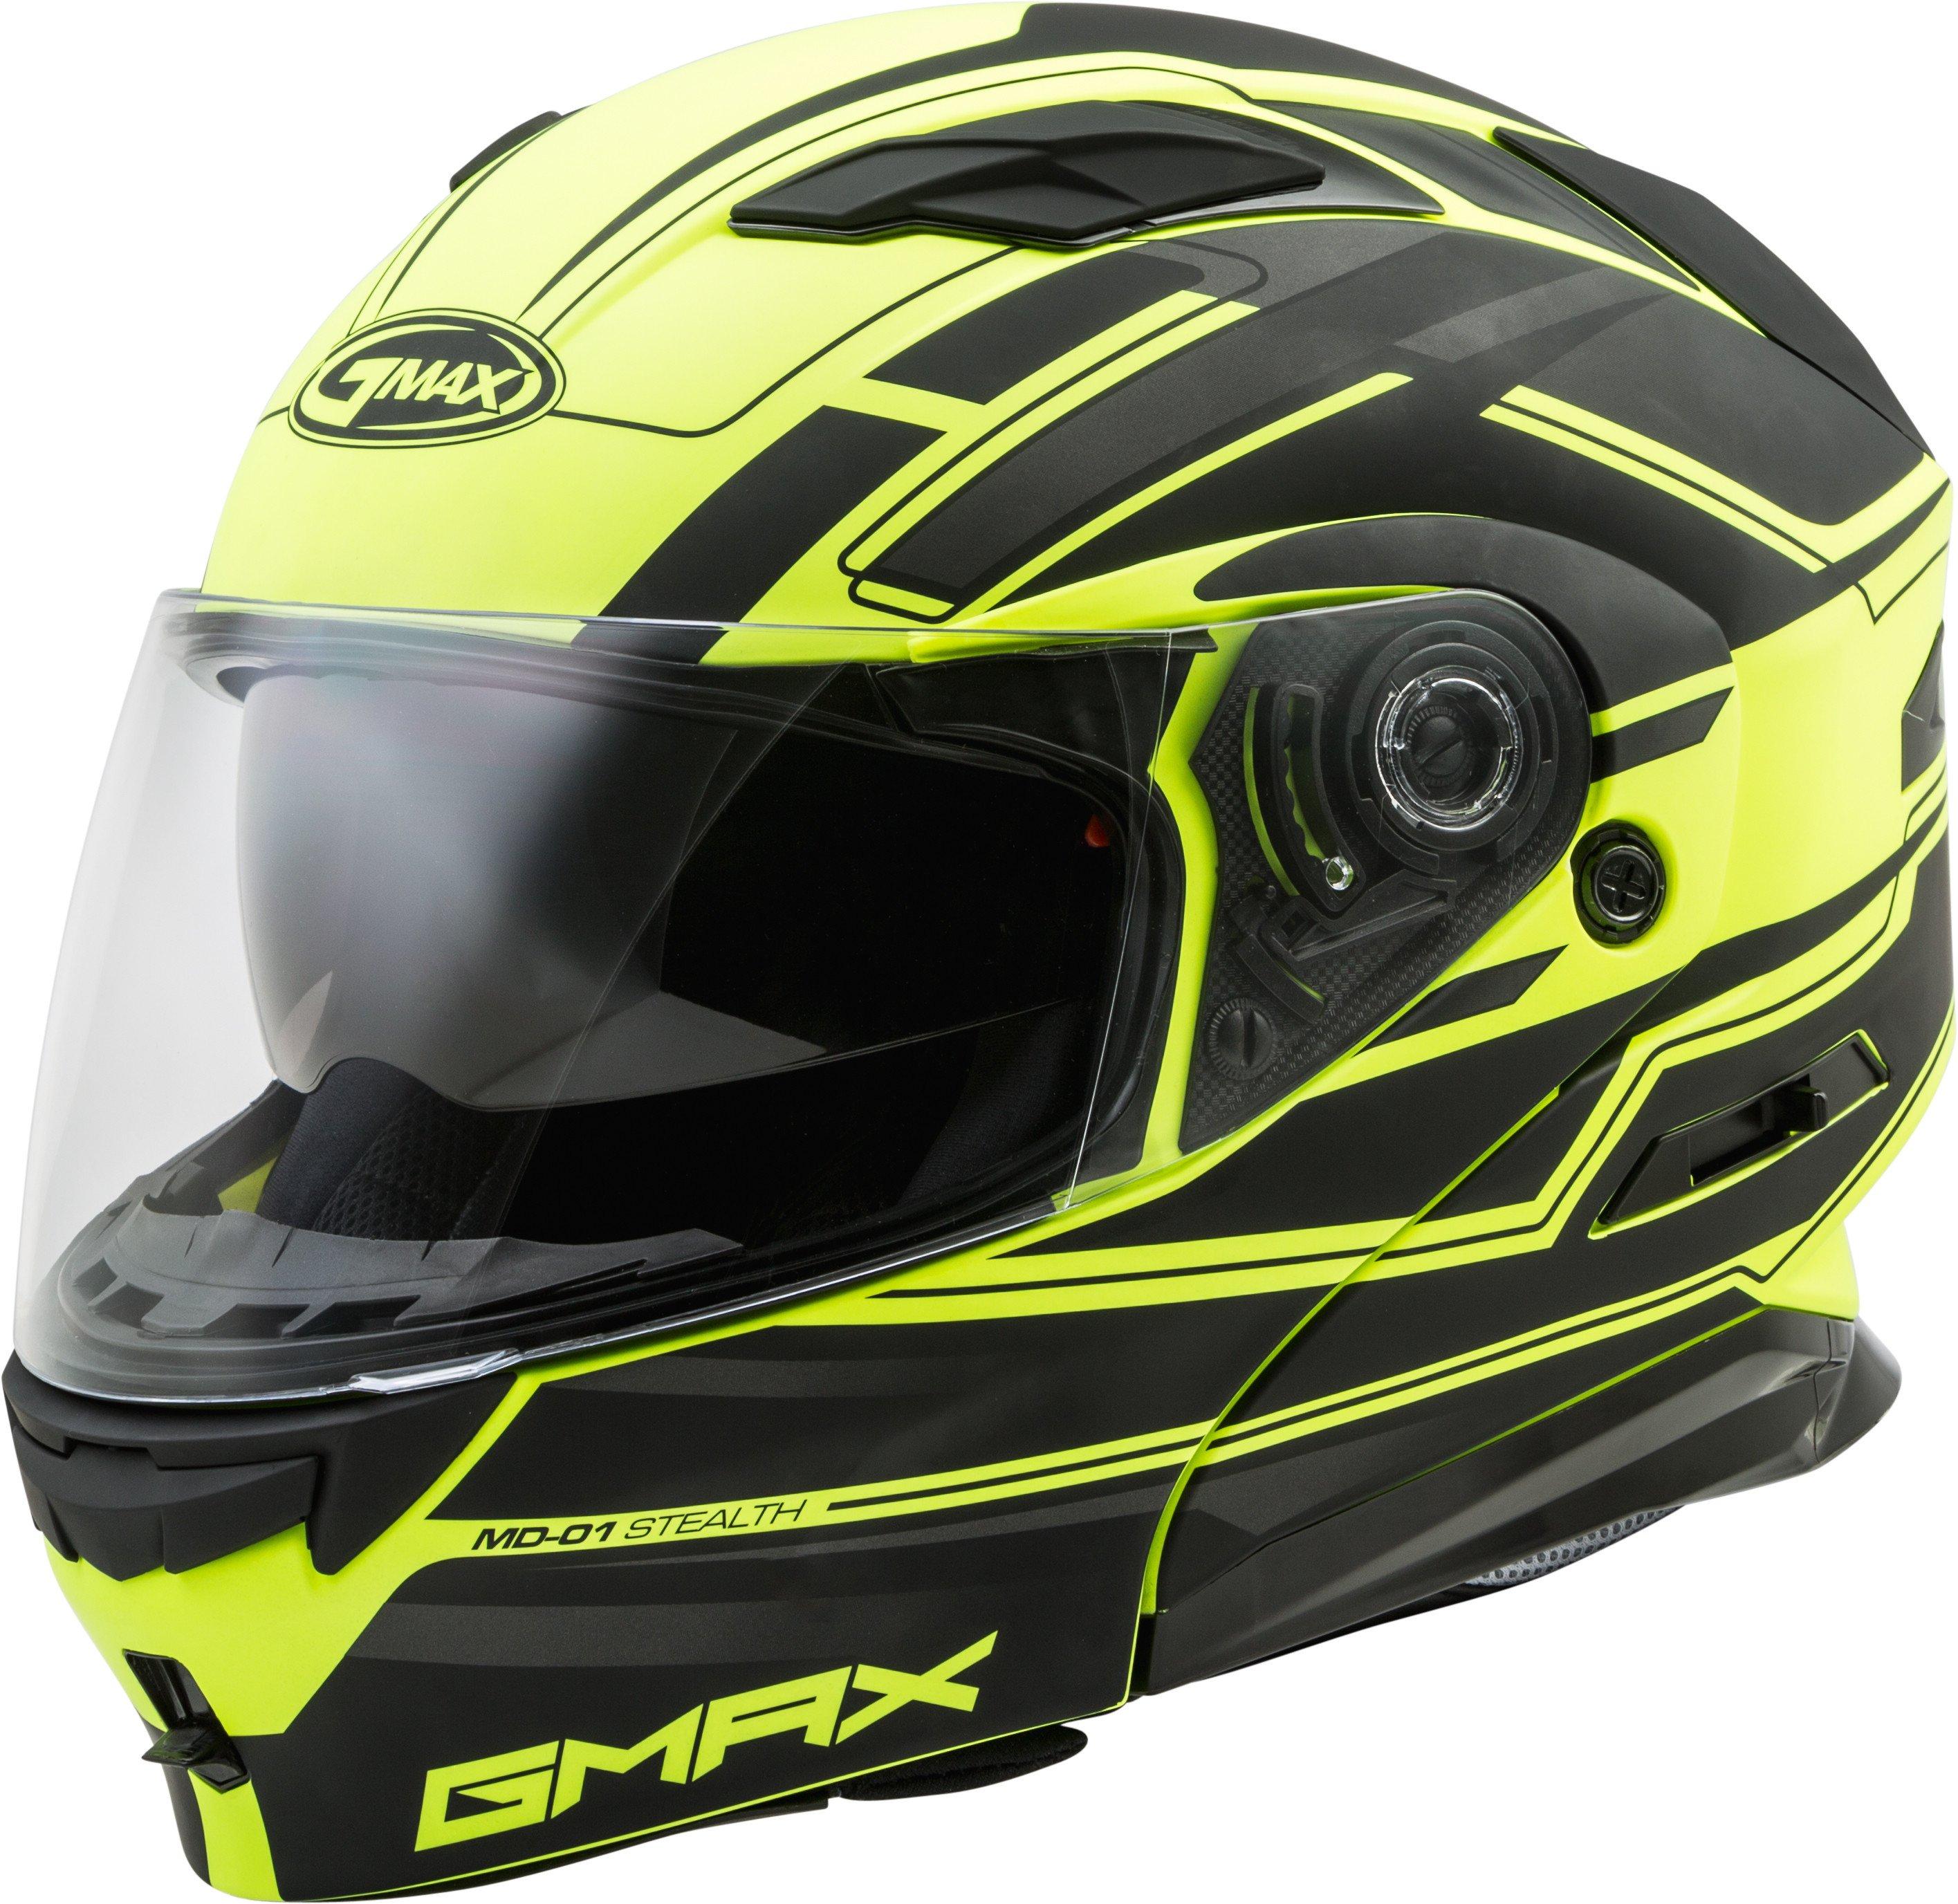 GMAX MD-01 Solid Helmet